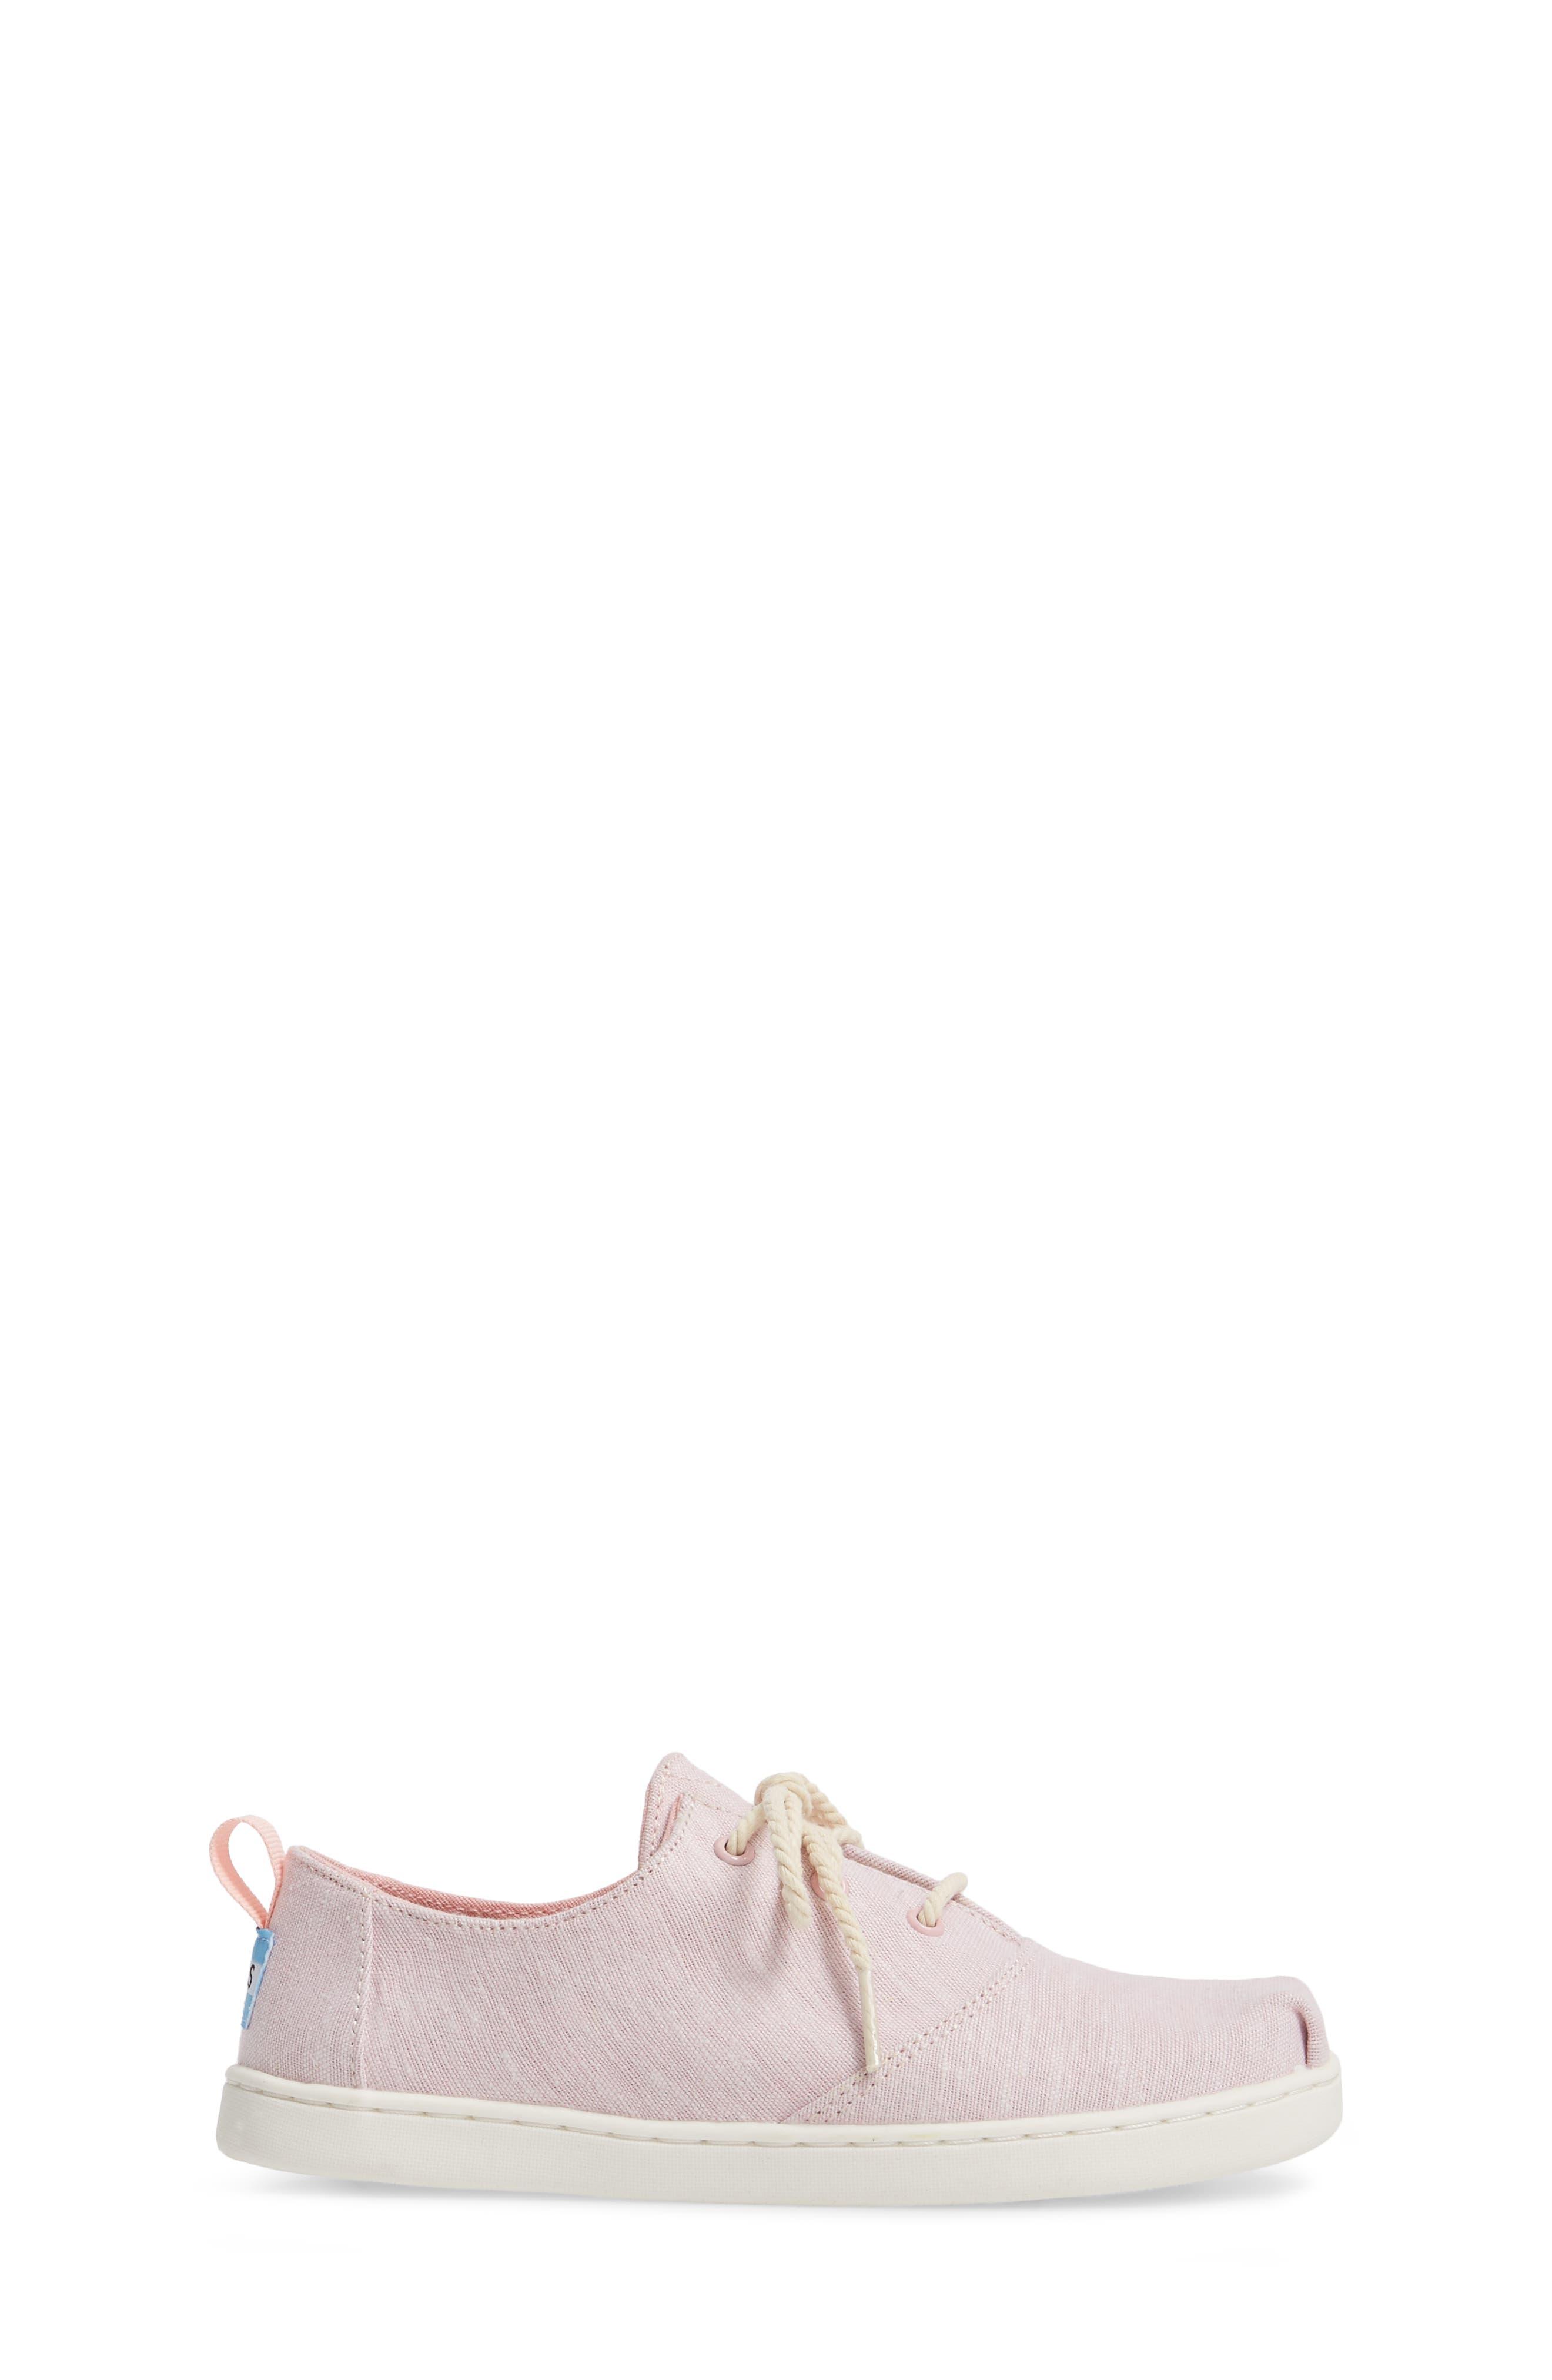 Lumin Sneaker,                             Alternate thumbnail 3, color,                             650